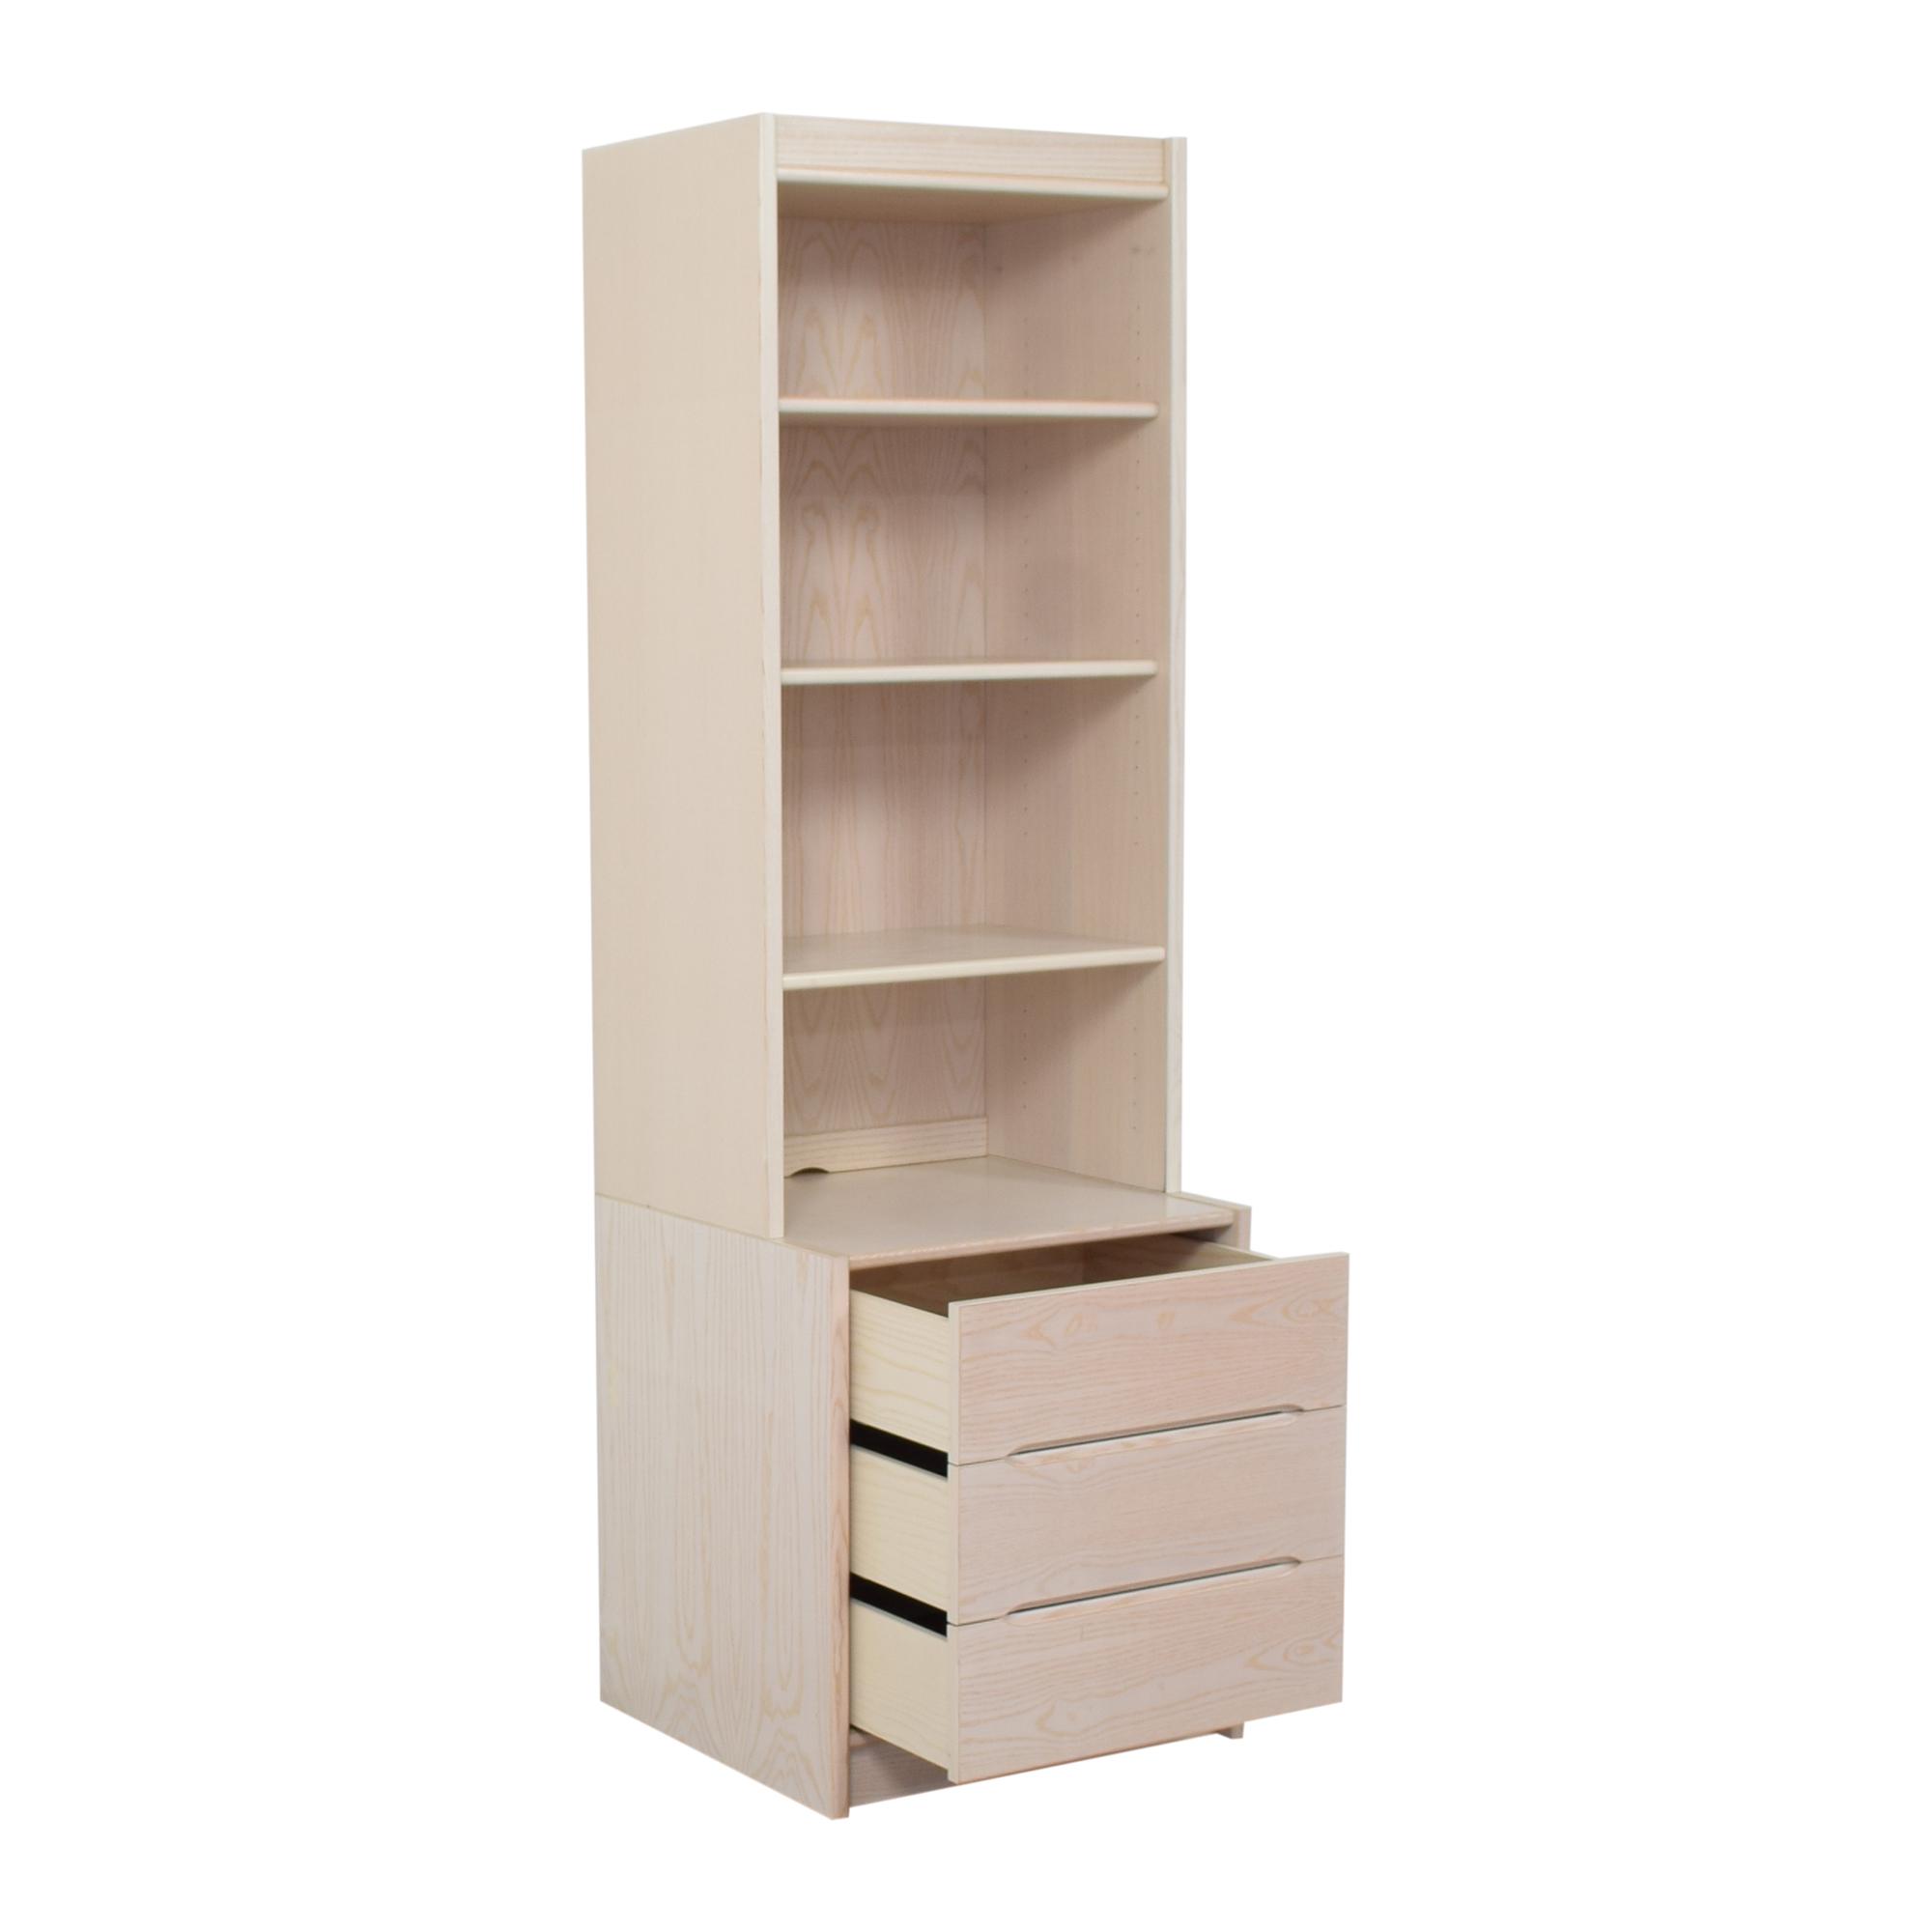 Door Store Door Store Bookcase with Three Drawers dimensions